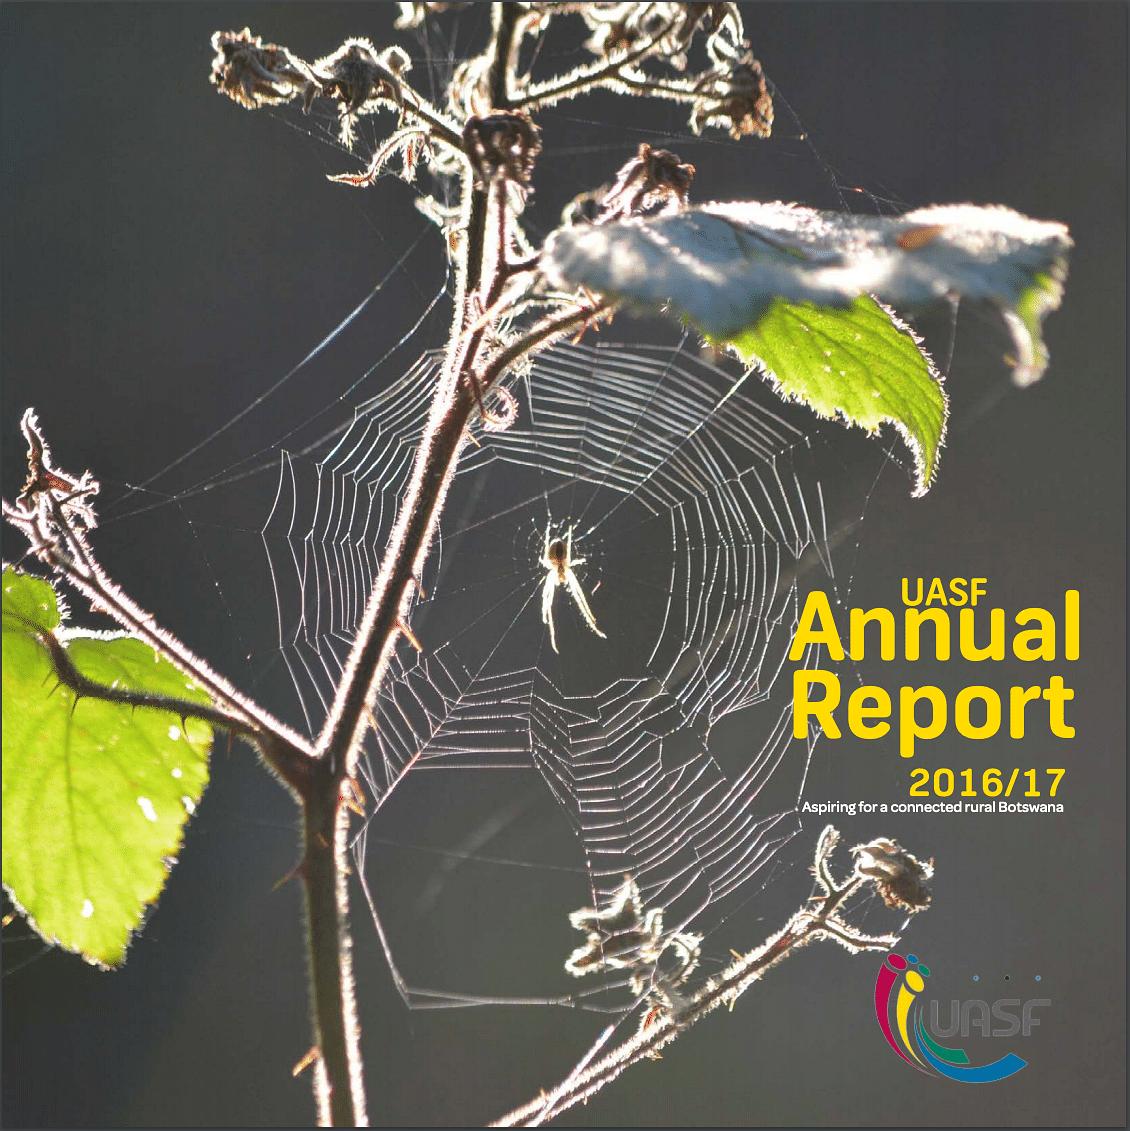 UASF Annual Report 2017 cover